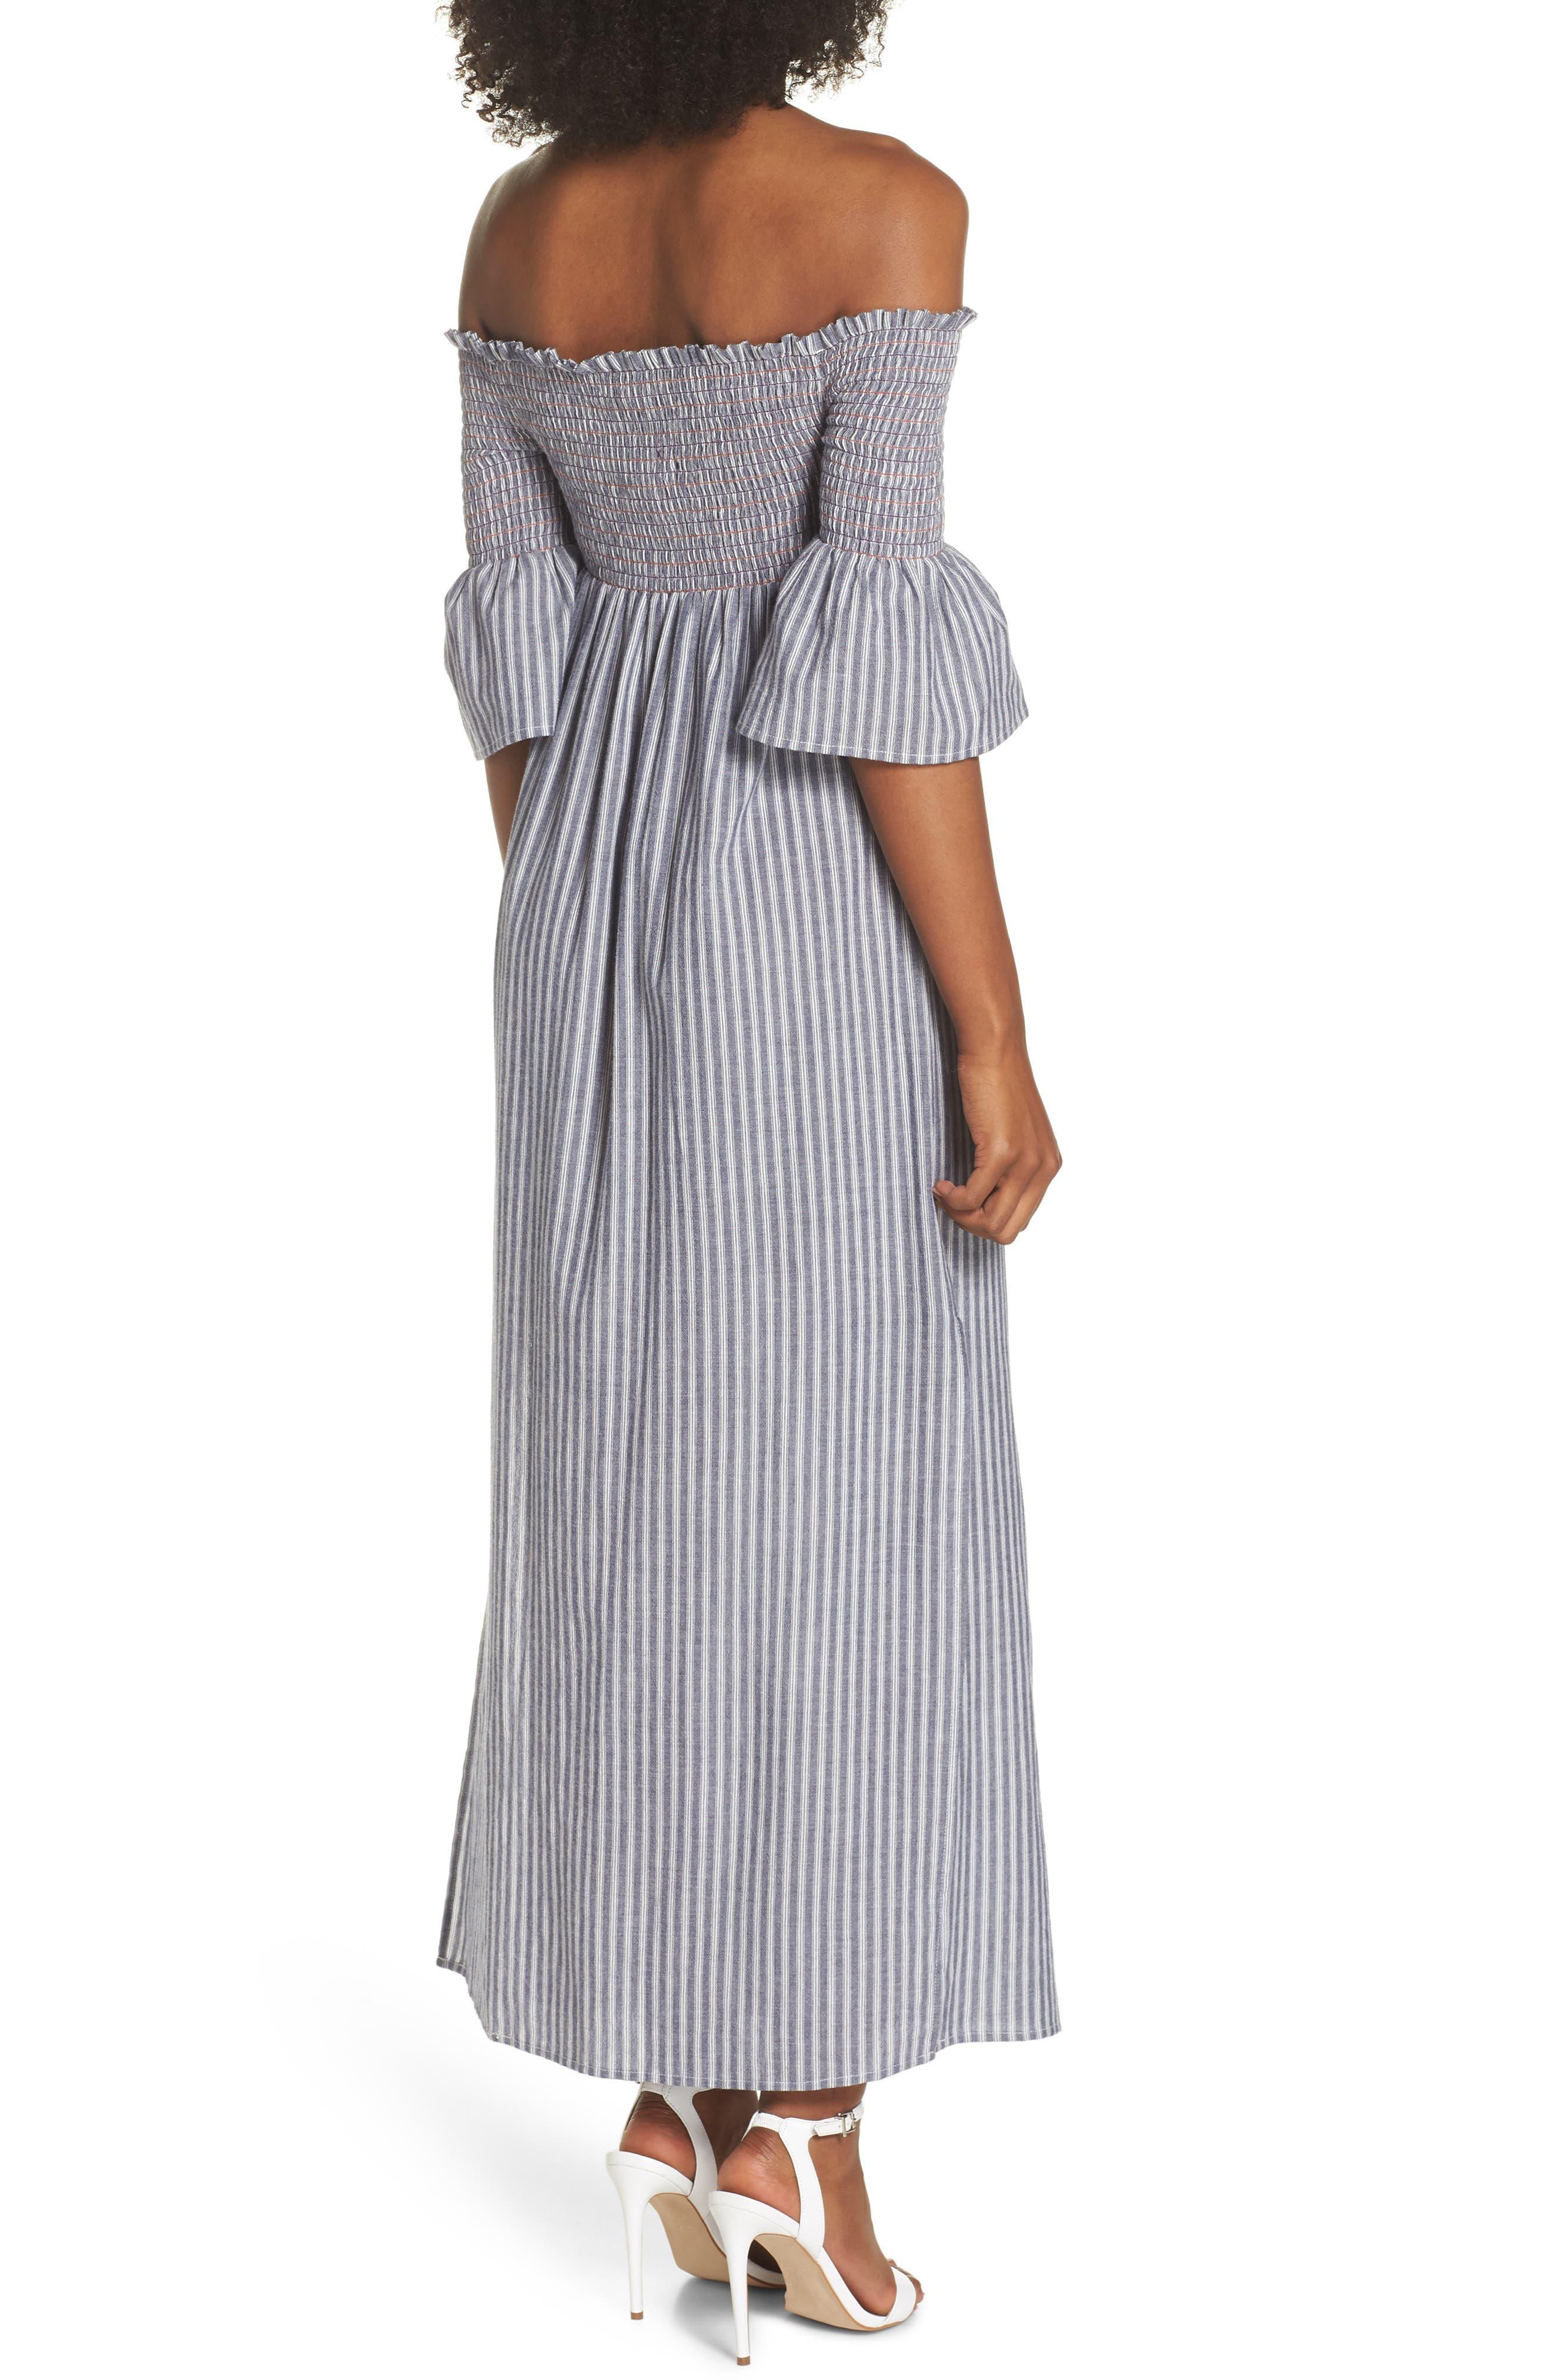 Carmel Smocked Off the Shoulder Maxi Dress,                             Alternate thumbnail 2, color,                             428